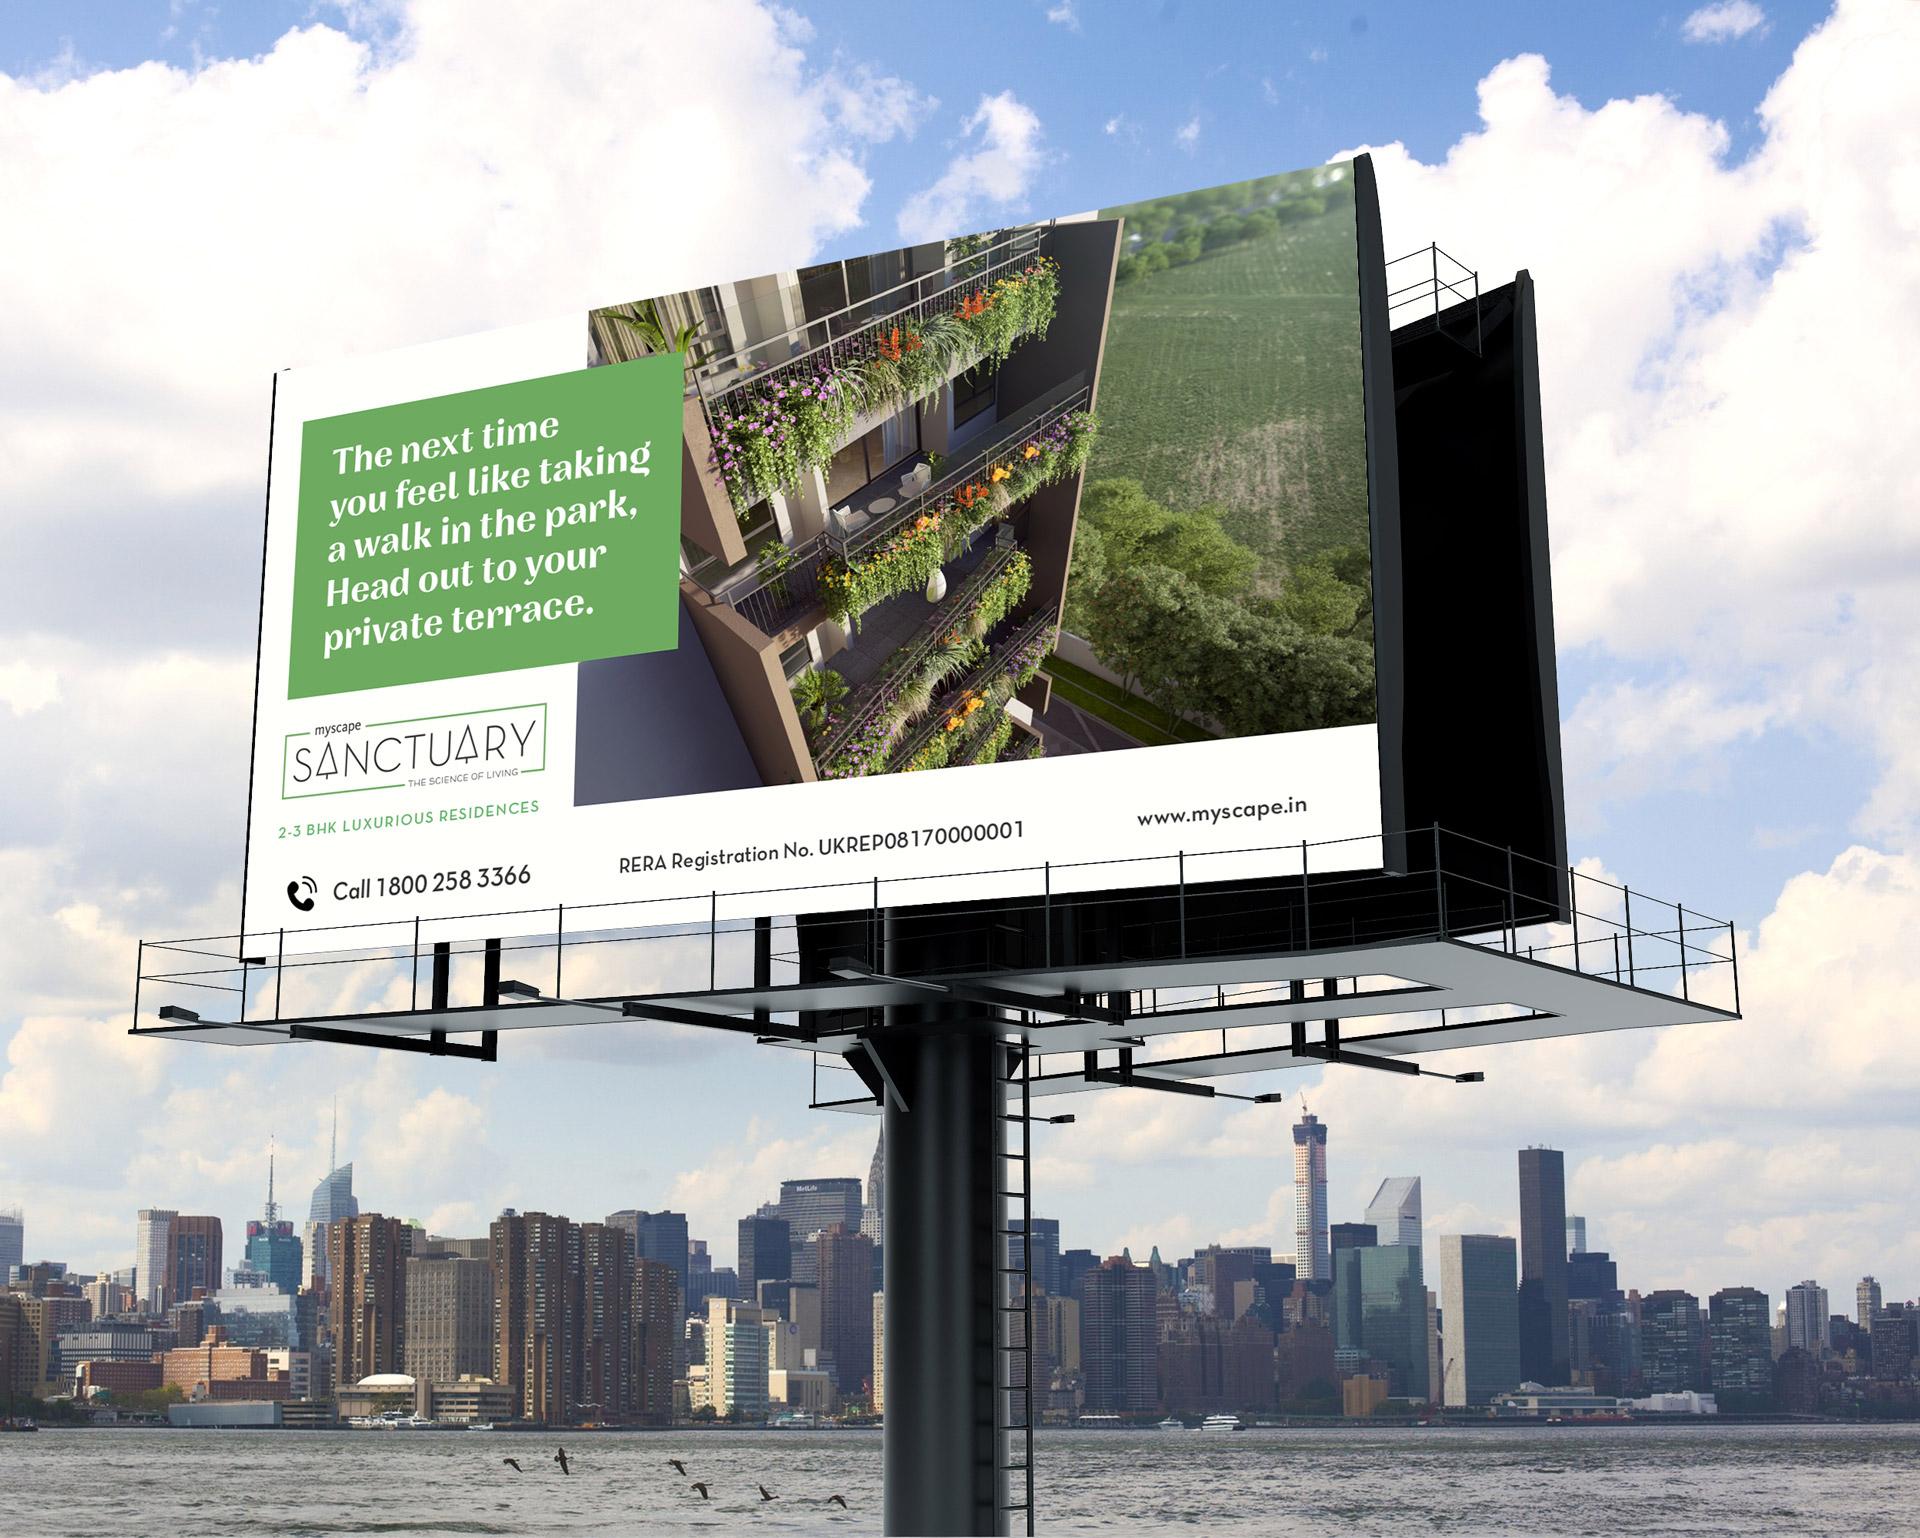 billboard-mockup-6